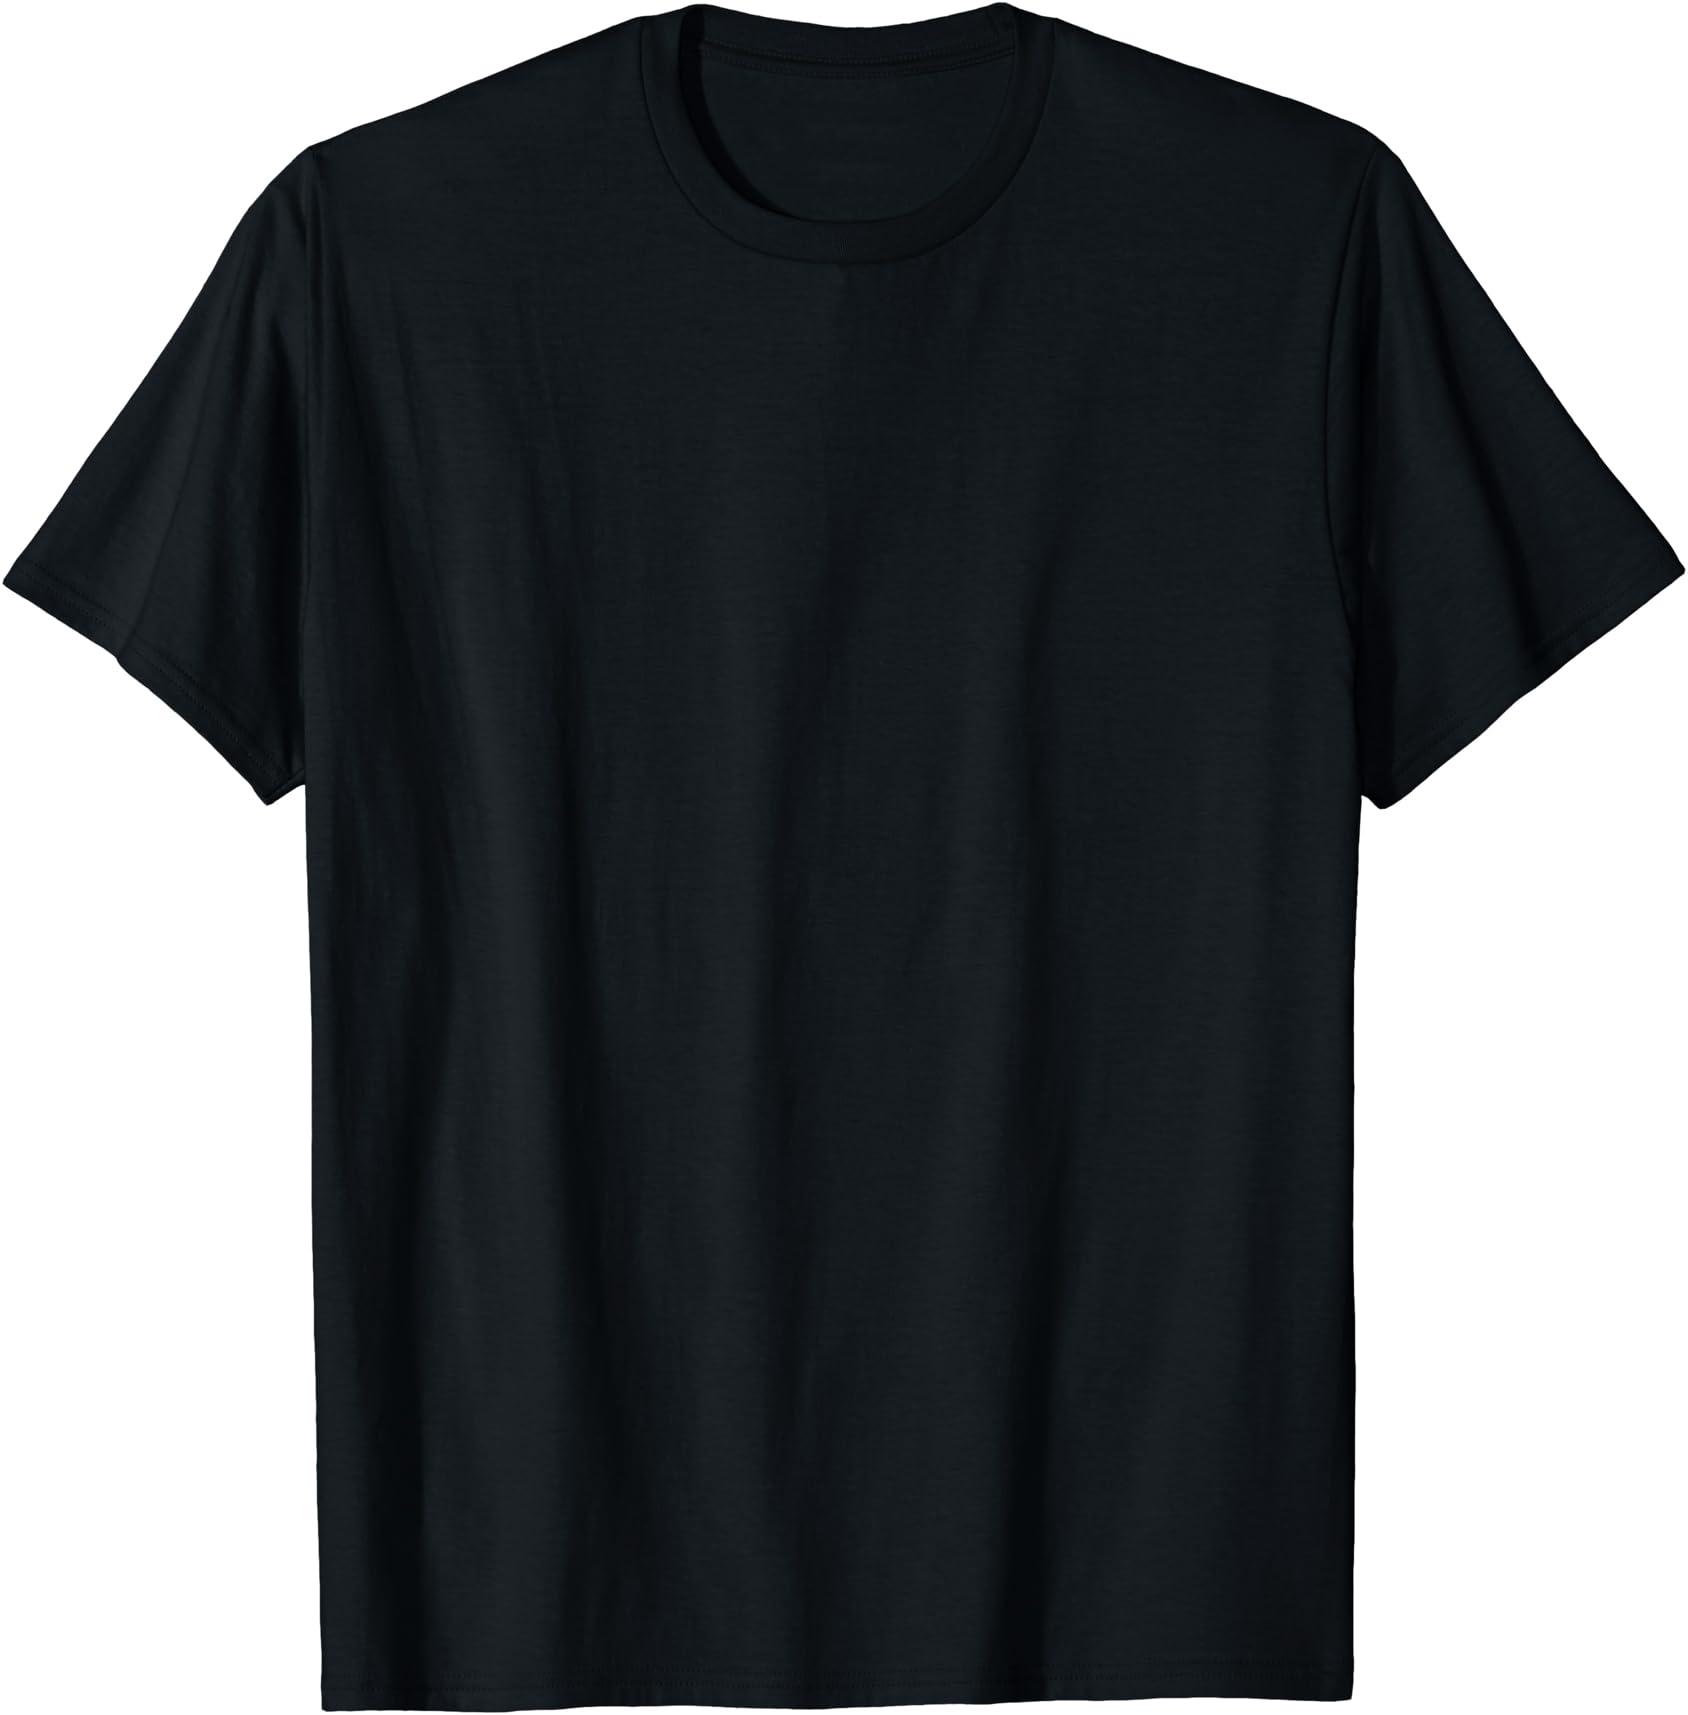 CCCP Soviet Union New Kids T-shirt